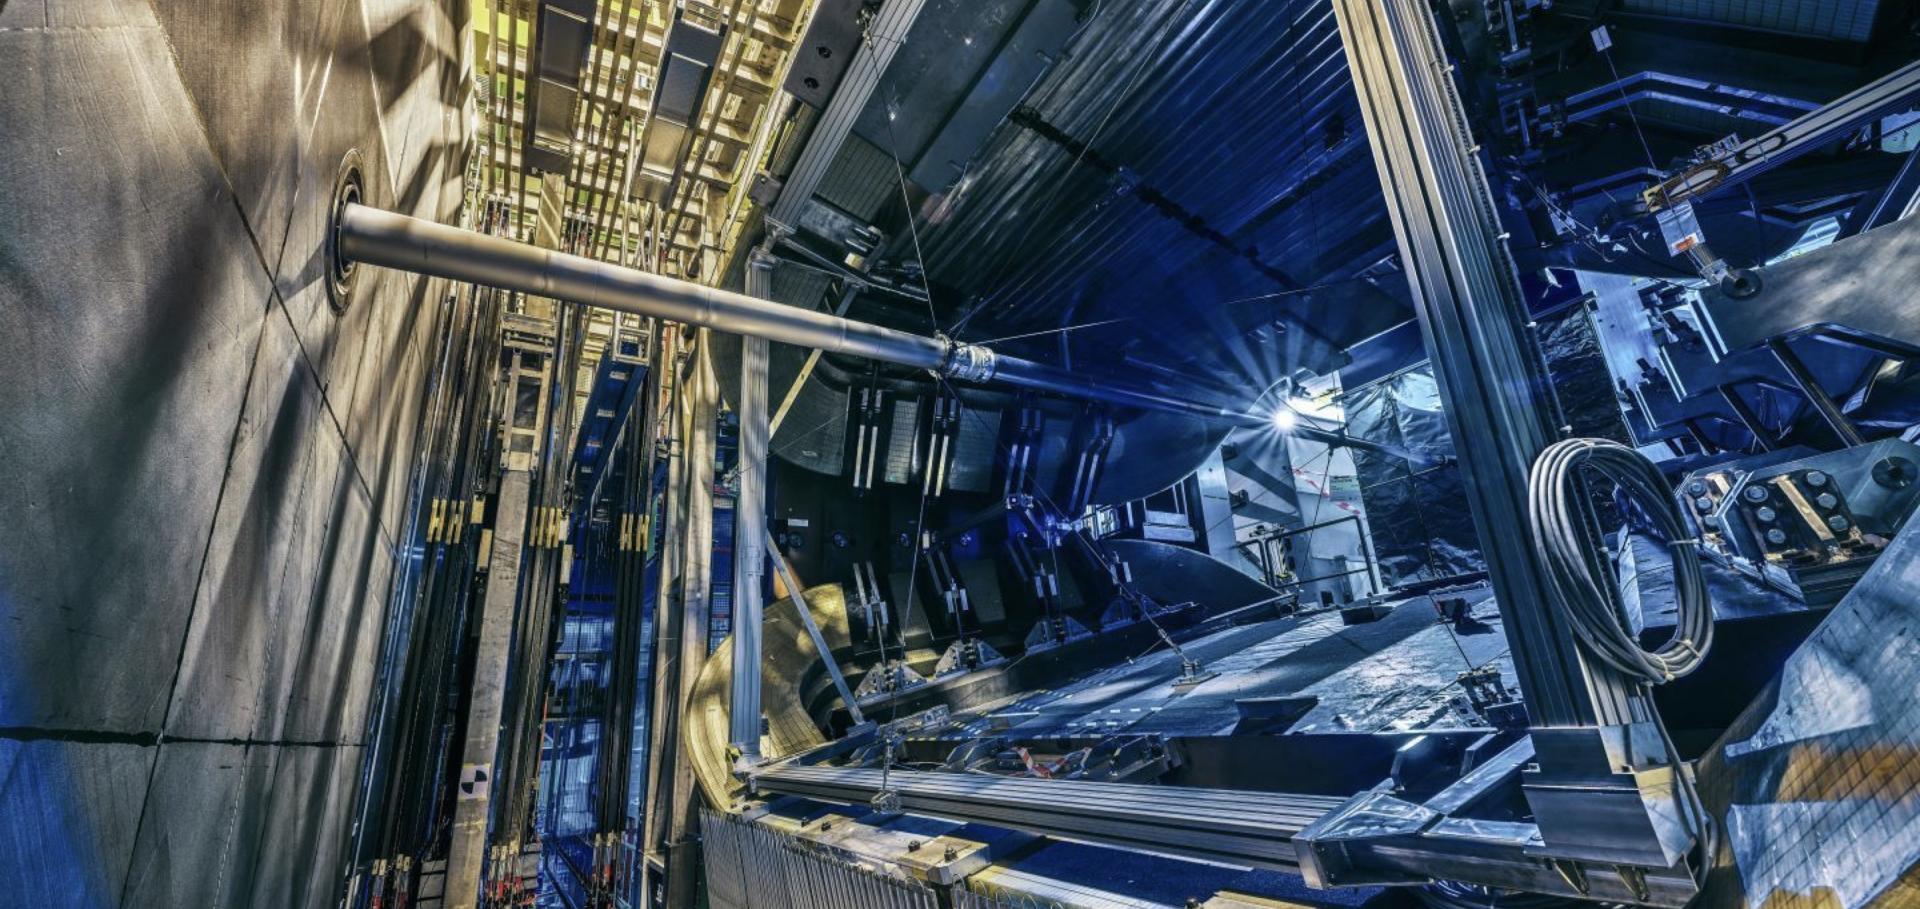 LHCb Image